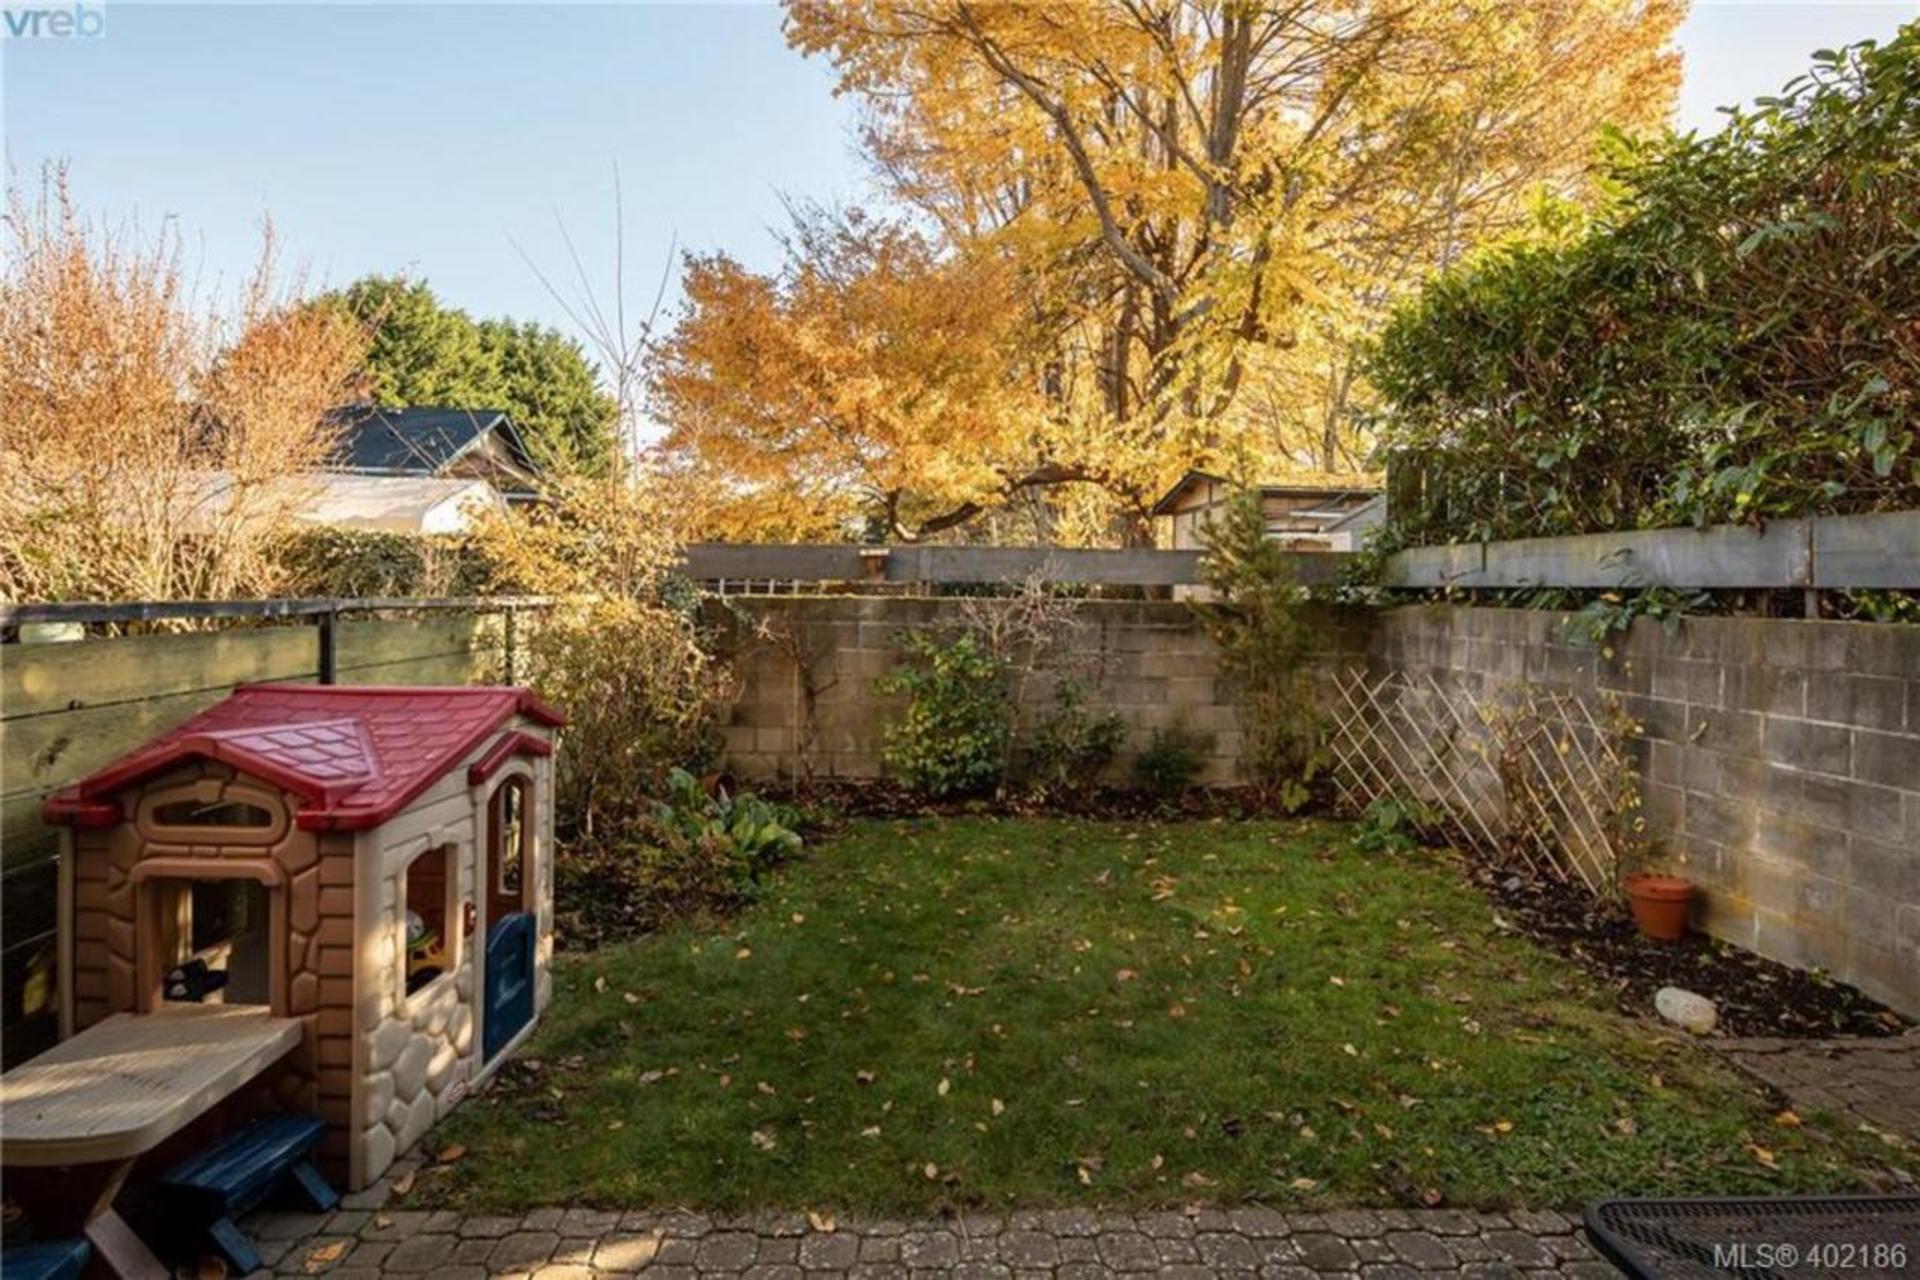 Enclosed Yard at 1545 North Dairy Road, Oaklands, Victoria